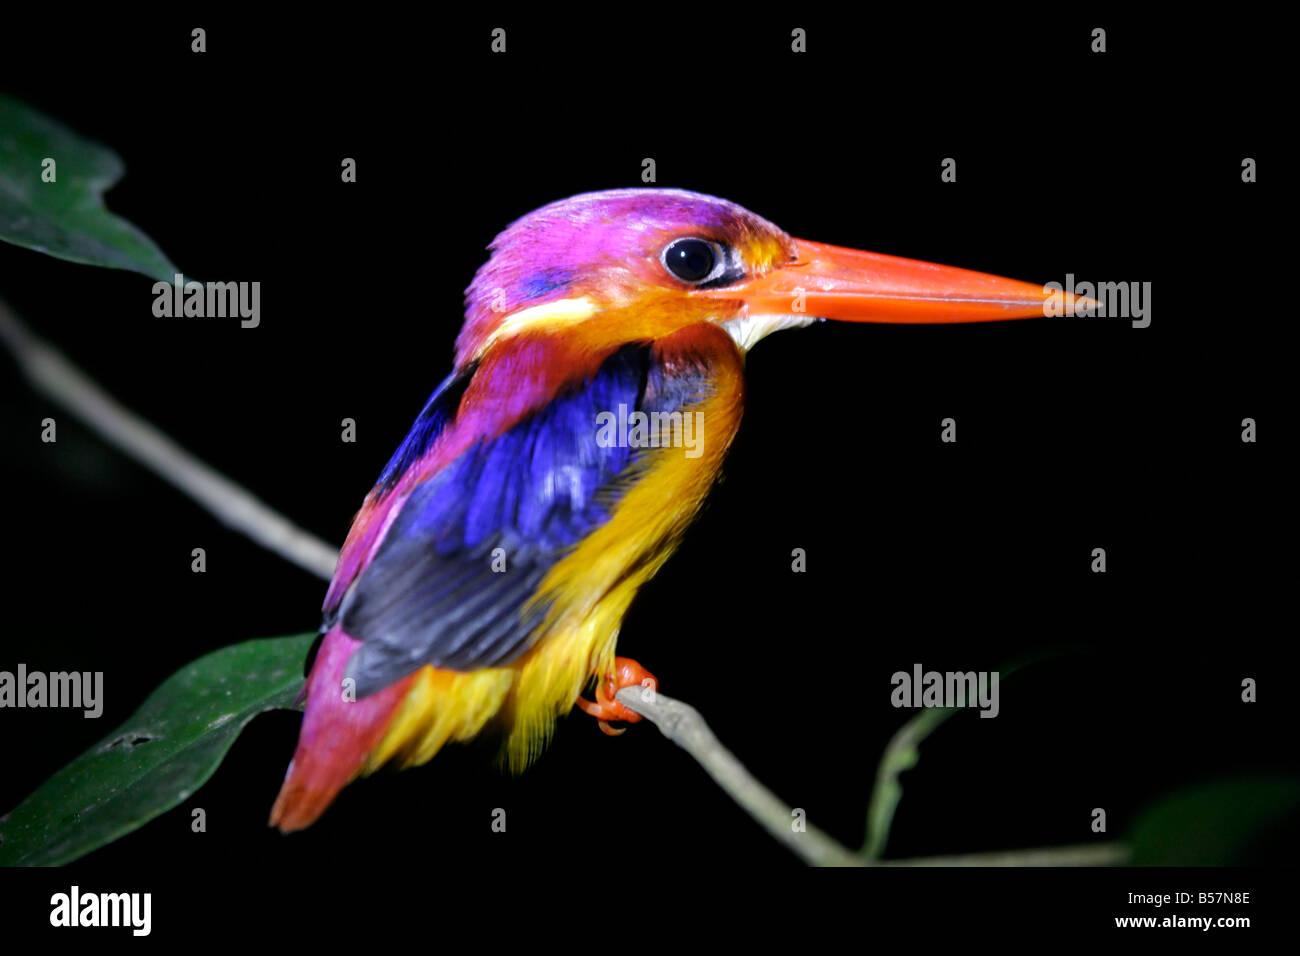 Kingfisher bird by night, Kinabatangan river, Sabah, Borneo, Malaysia, South East Asia - Stock Image